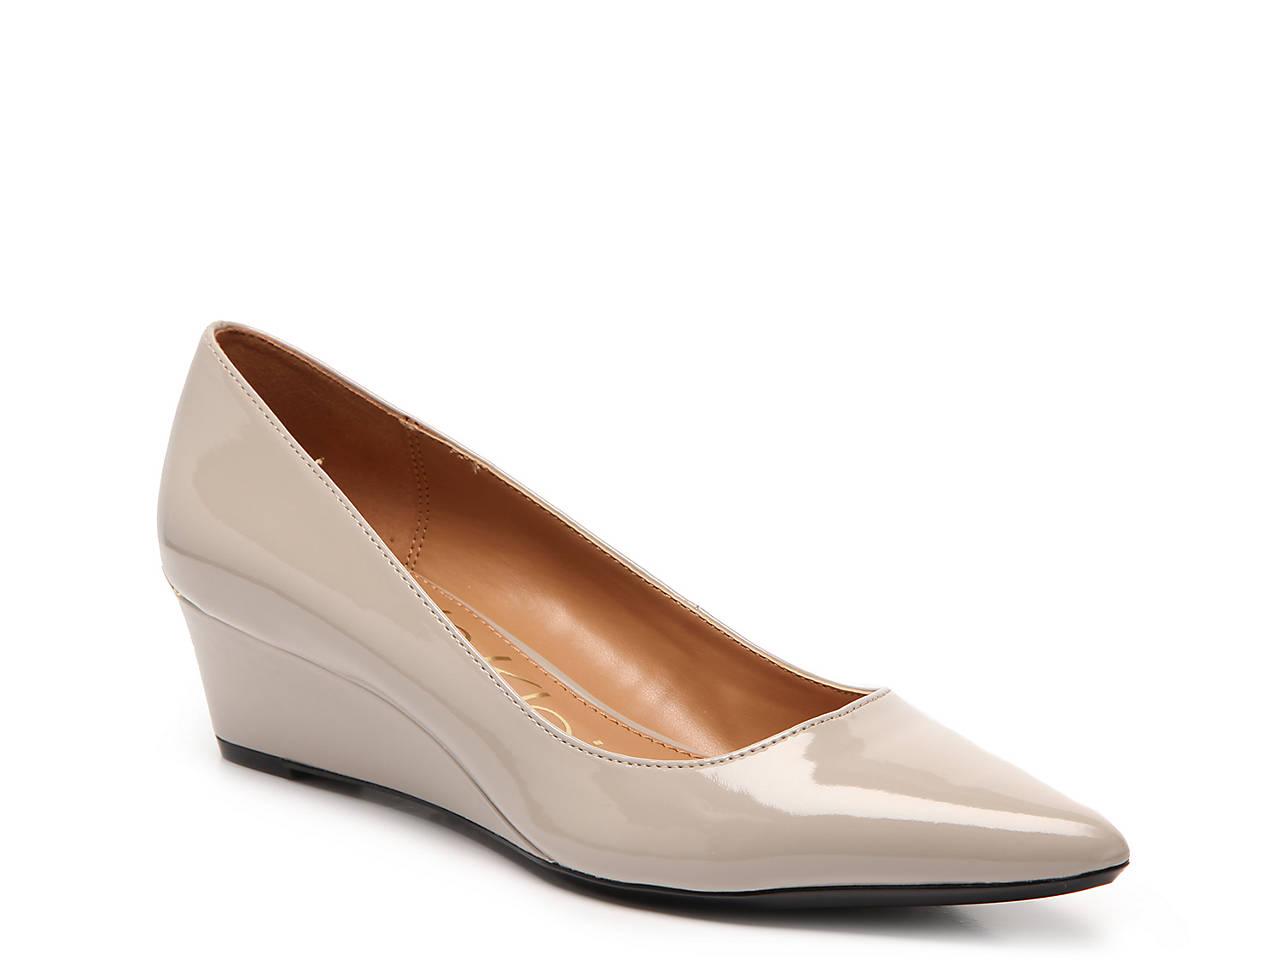 86810f5ac43 Calvin Klein Garya Wedge Pump Women s Shoes